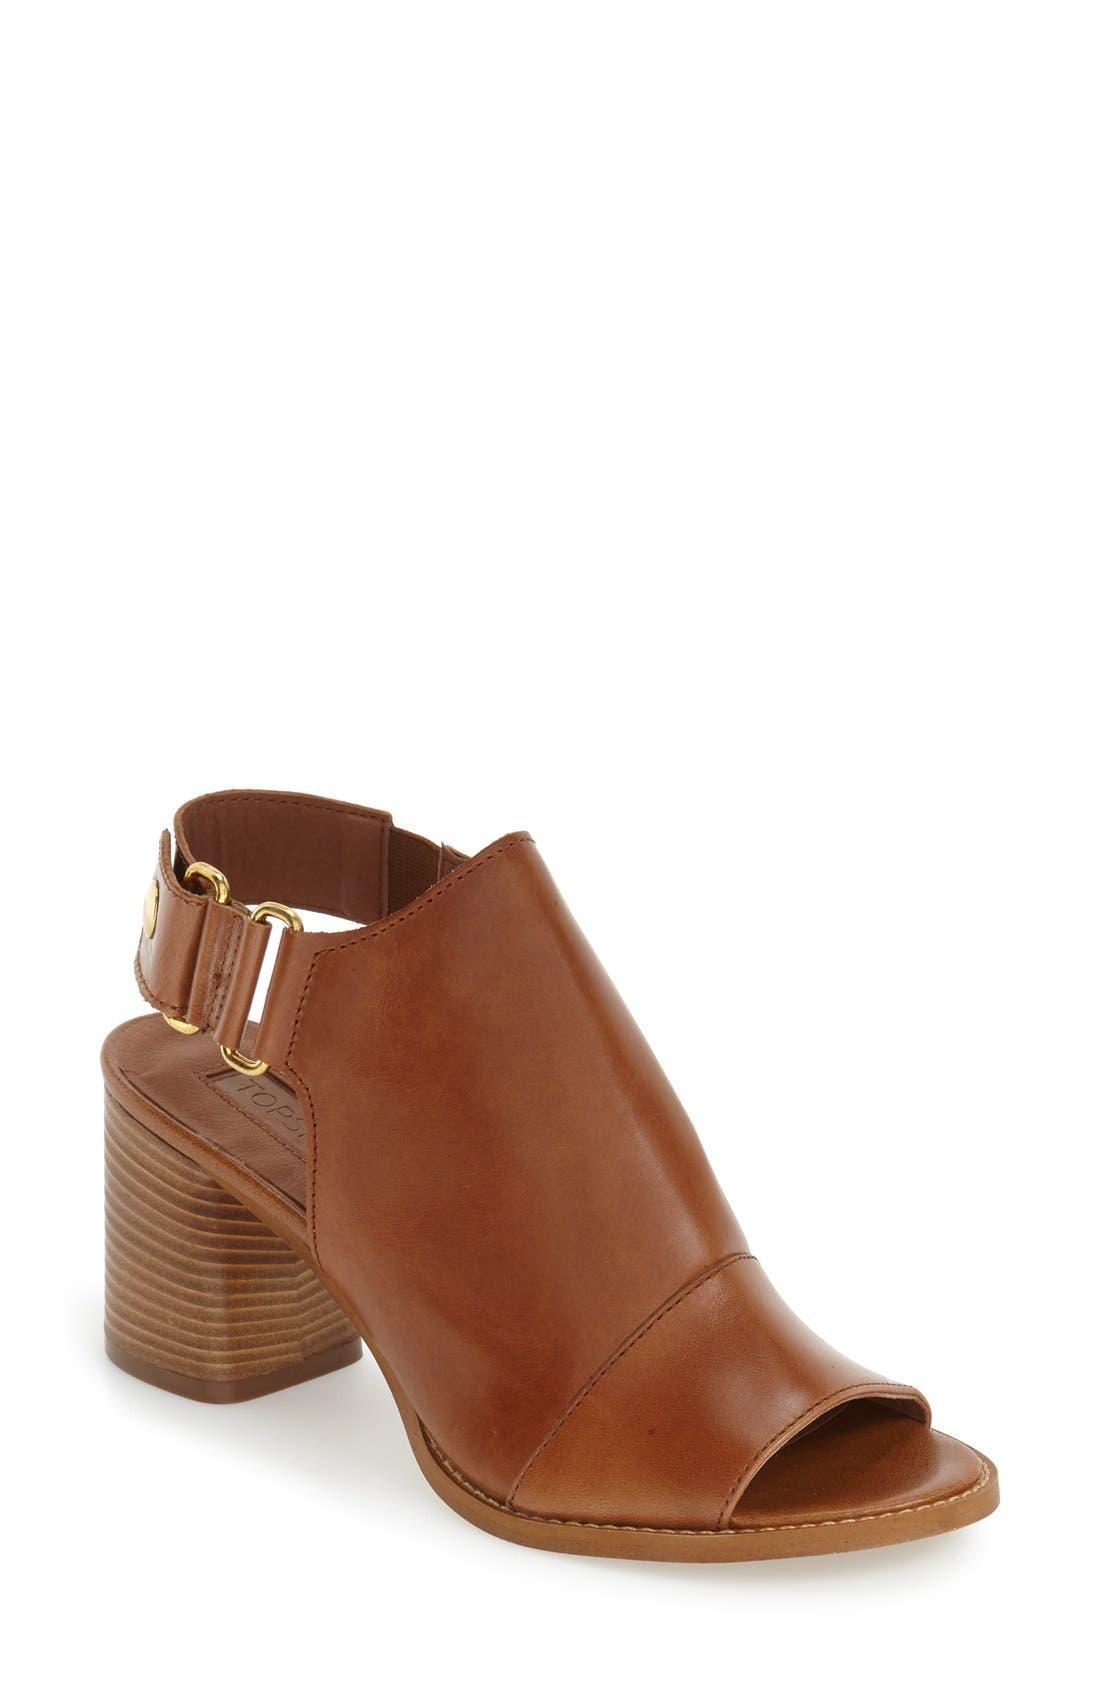 Alternate Image 1 Selected - Topshop 'Nimi' Slingback Round Heel Sandal (Women)